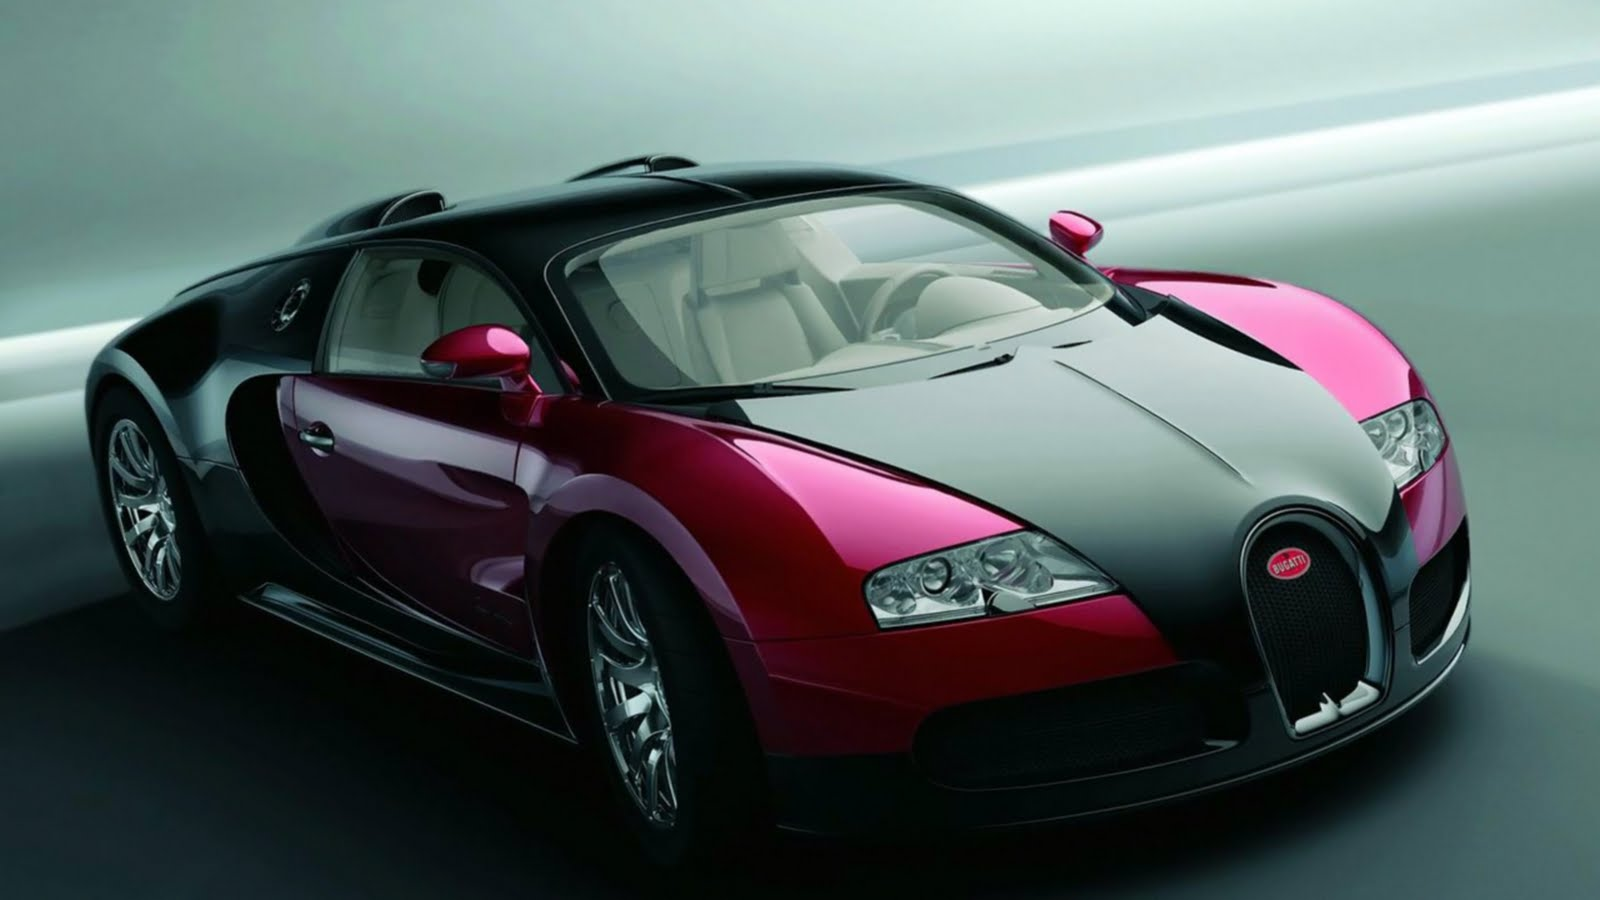 bugatti veyron car sports car racing car luxury sports cars indian car. Black Bedroom Furniture Sets. Home Design Ideas